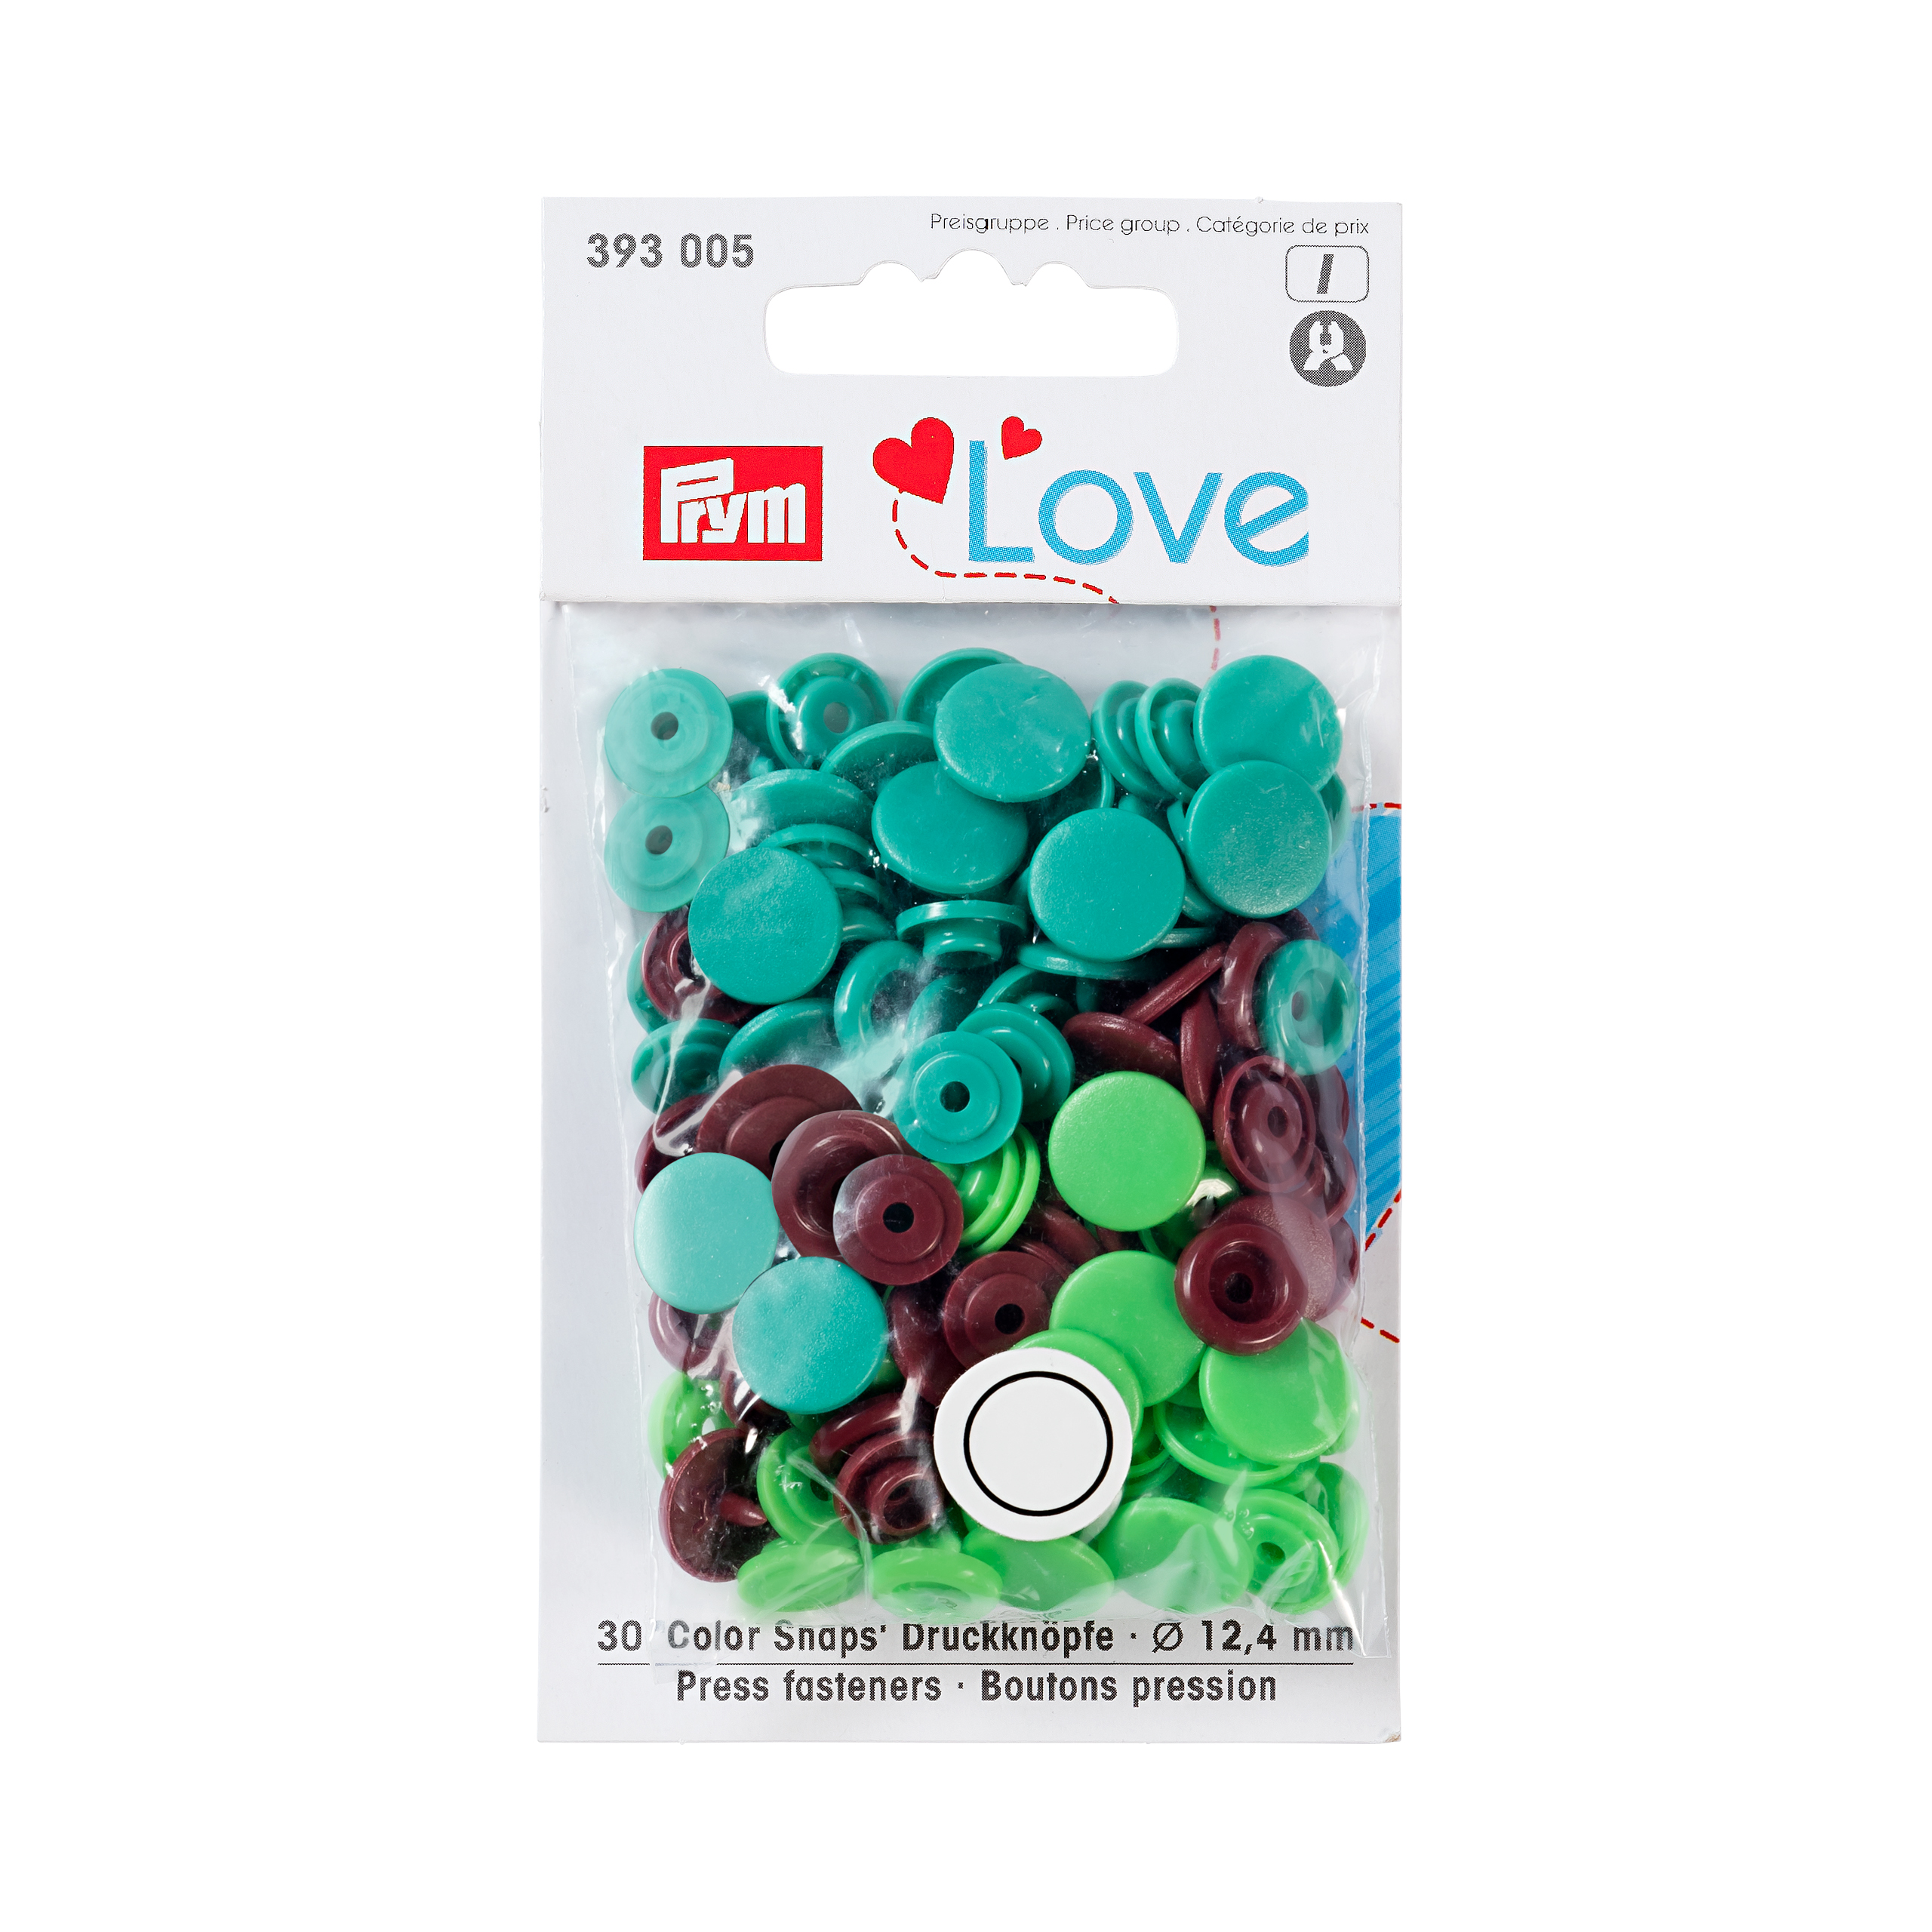 "Druckknopfe Color Snaps, grün, ""Prym-Love"", Prym - Art. 393005"